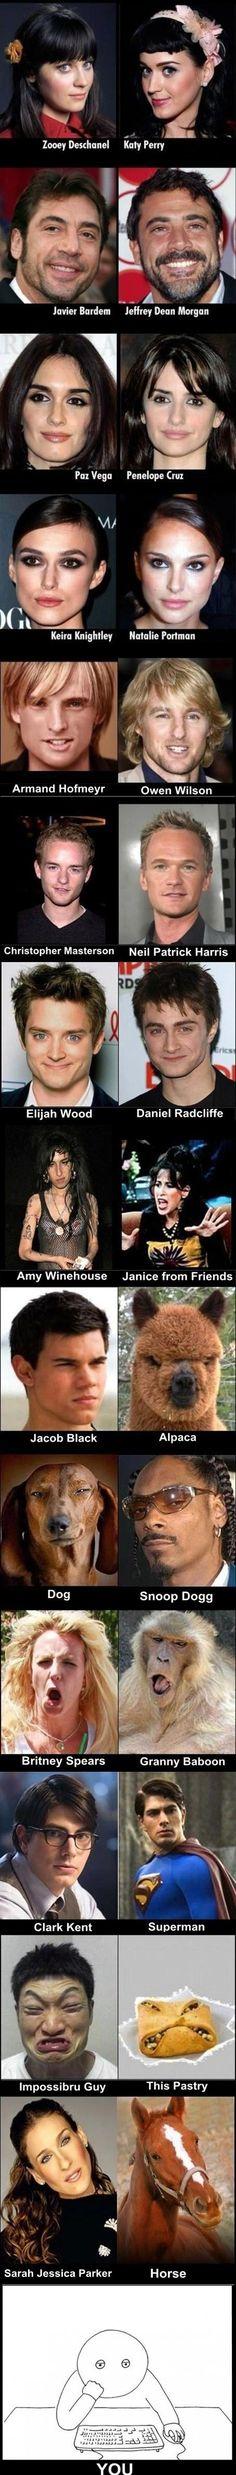 Celebrity lookalikes..haha